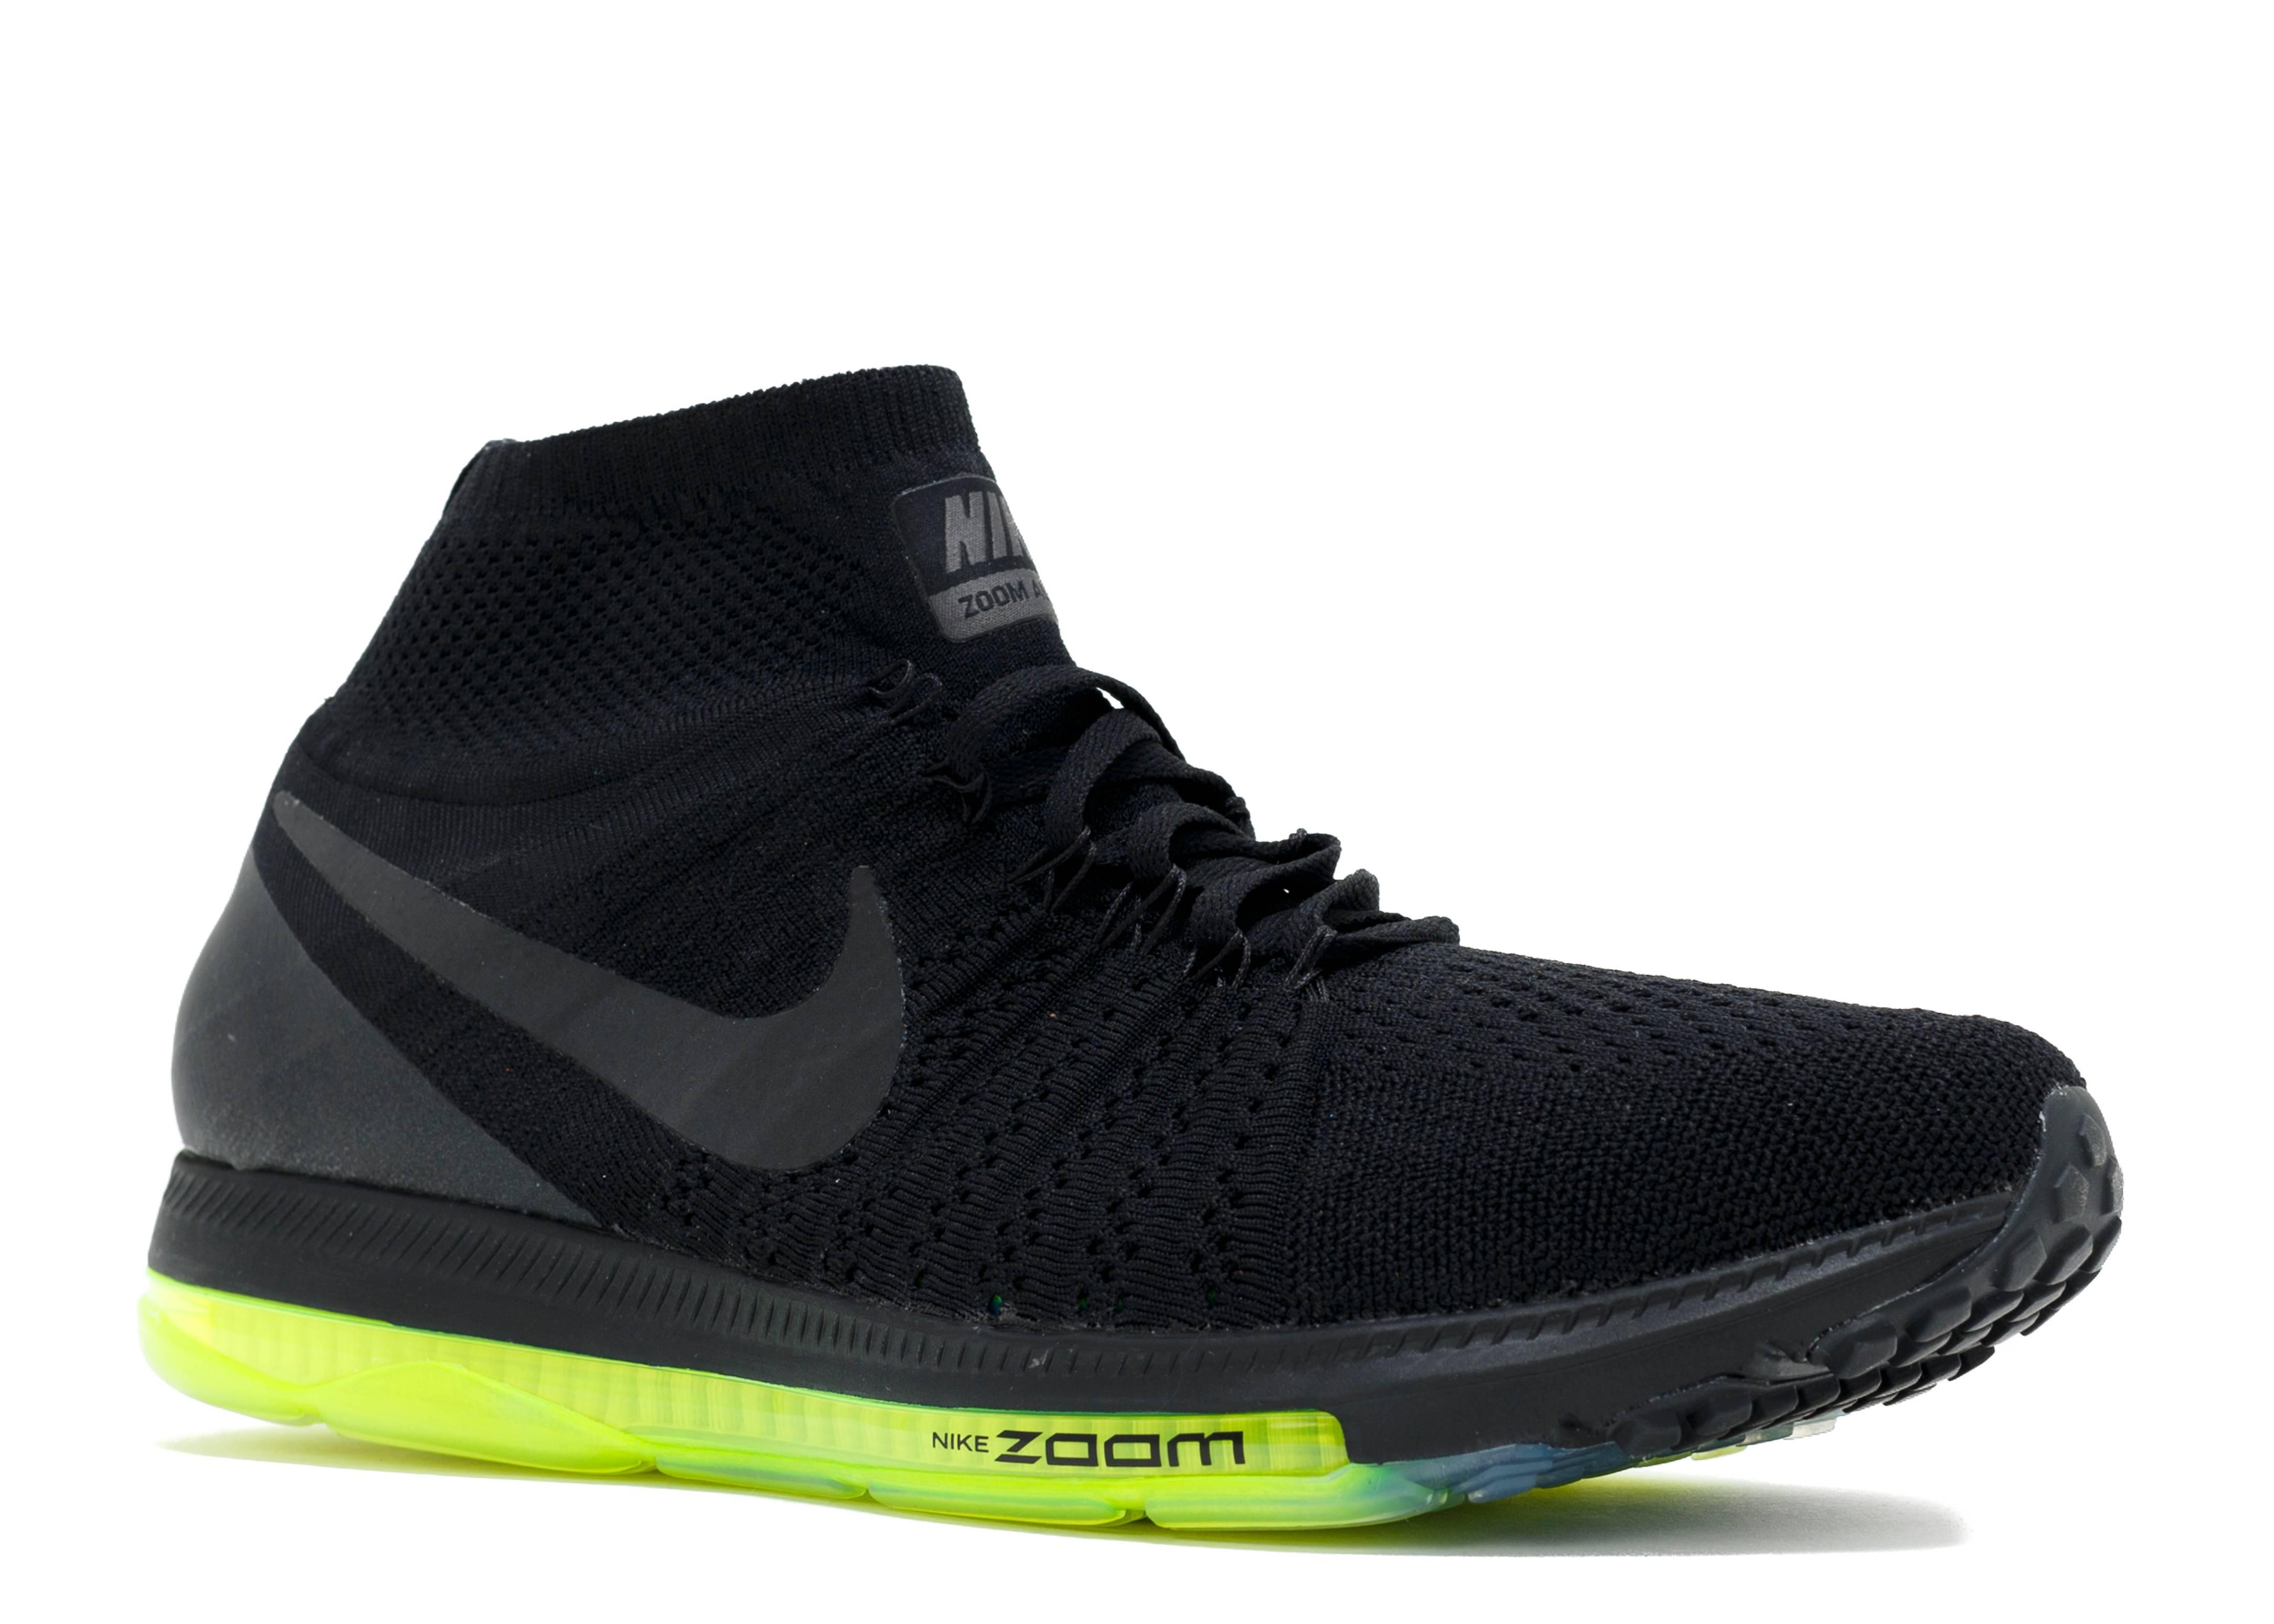 Zoom All Out Flyknit - Nike - 844134 001 - black/black-volt | Flight Club